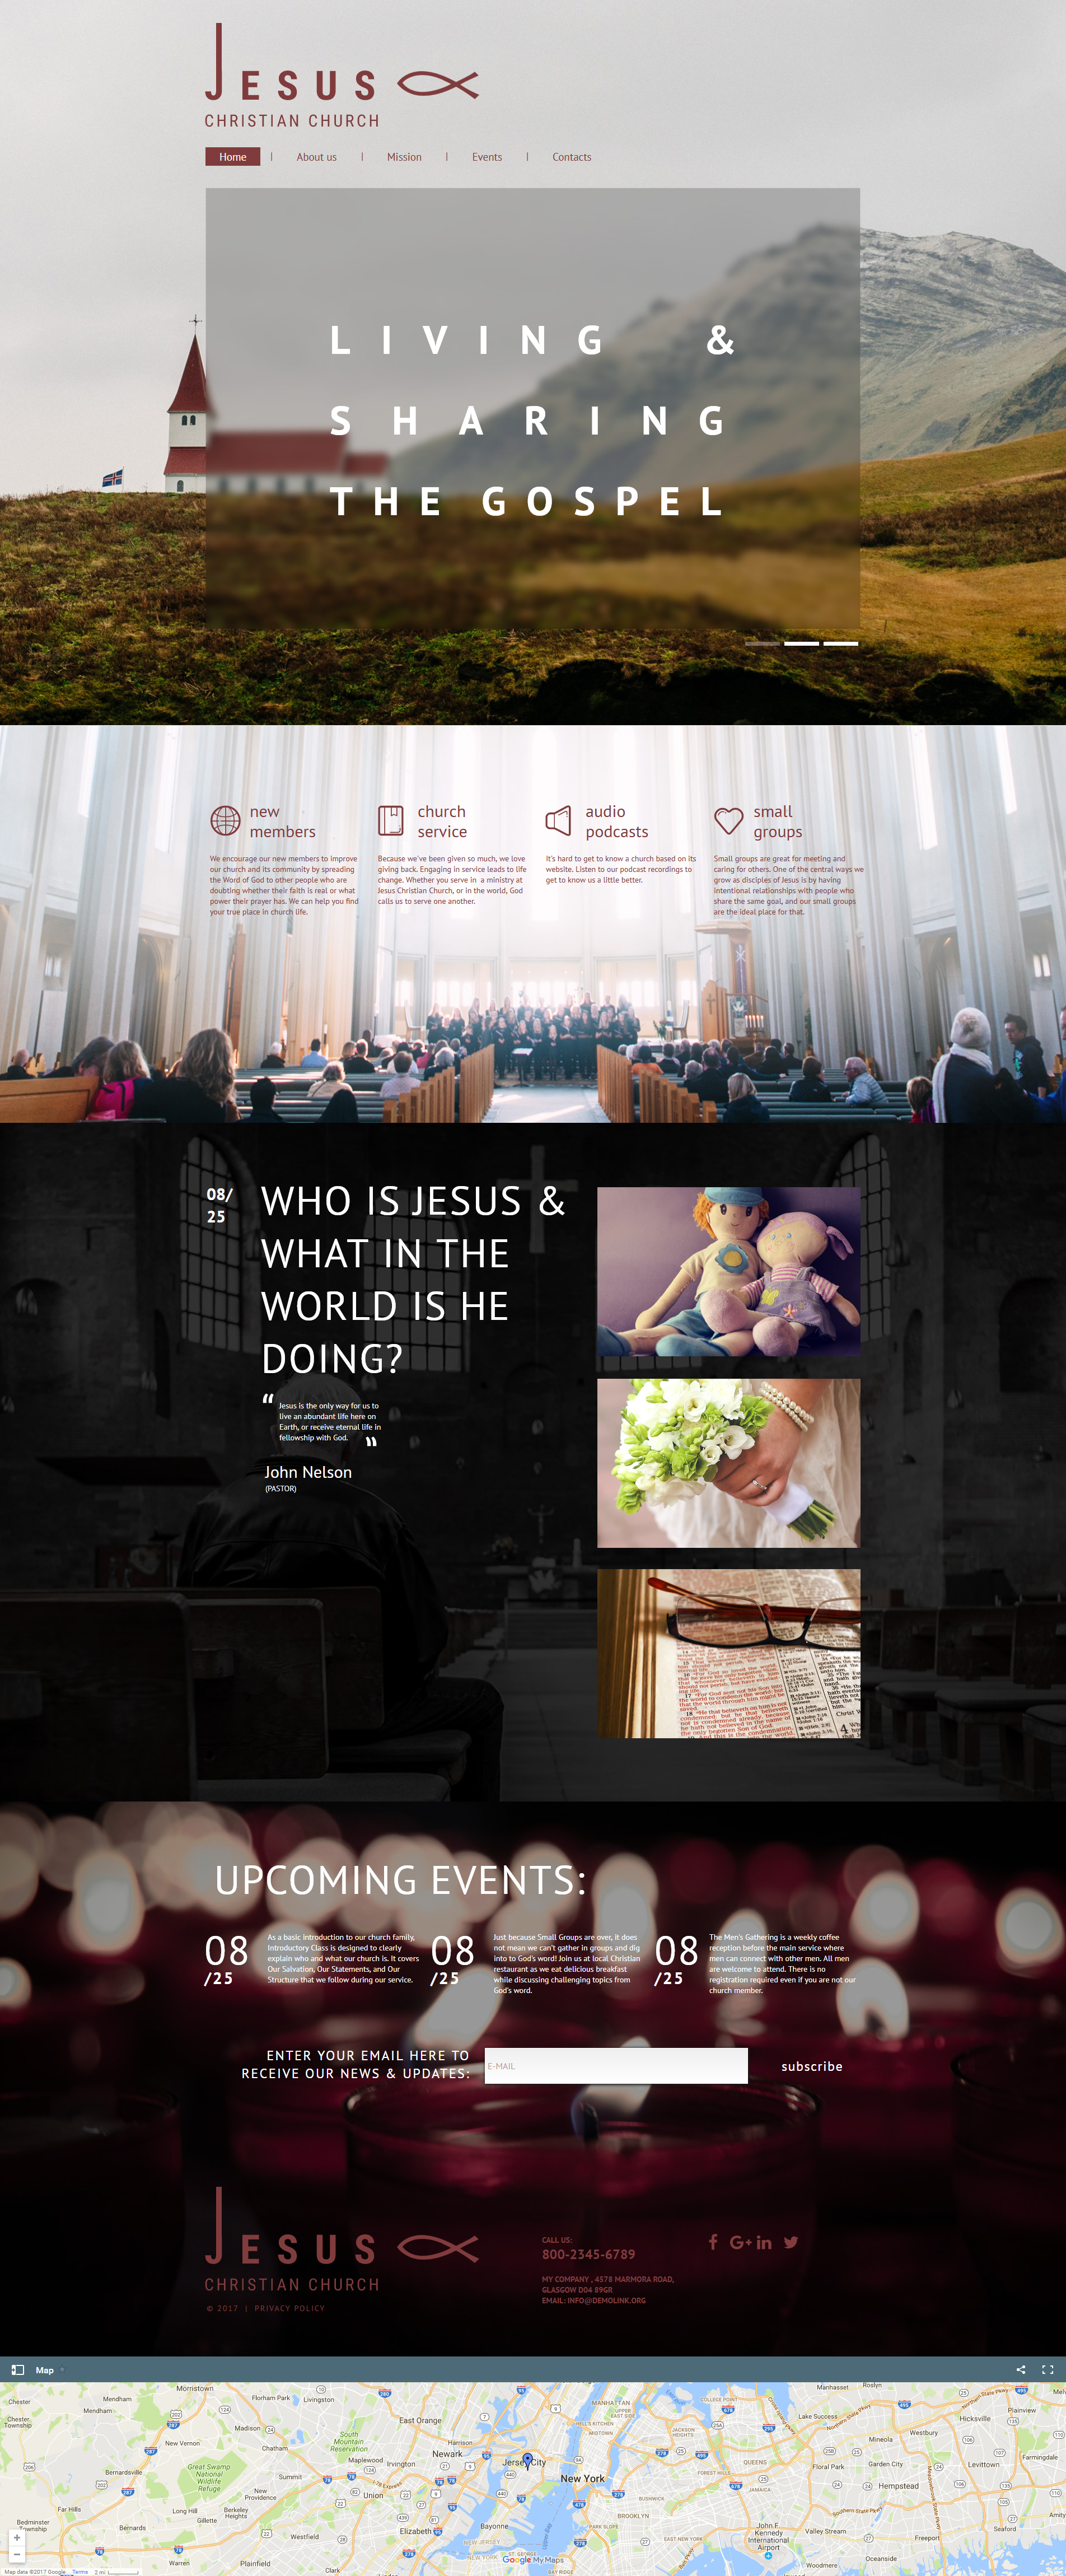 """Jesus - Christian Church"" - MotoCMS HTML шаблон №59306 - скріншот"